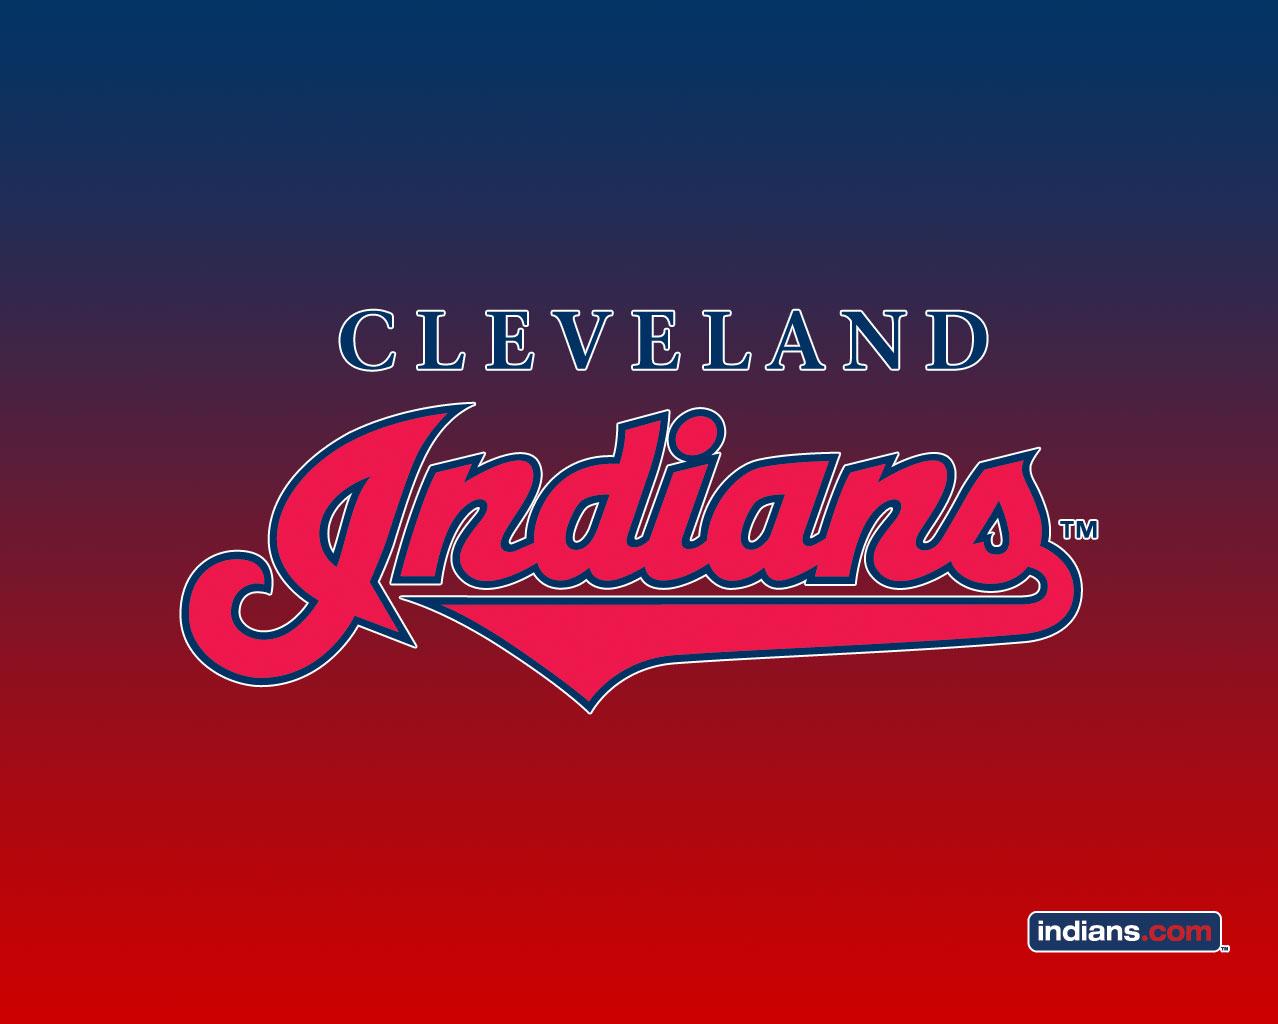 Cleveland Indians w/ Gradient Background | 1280 x 1024 | 1024 x 768